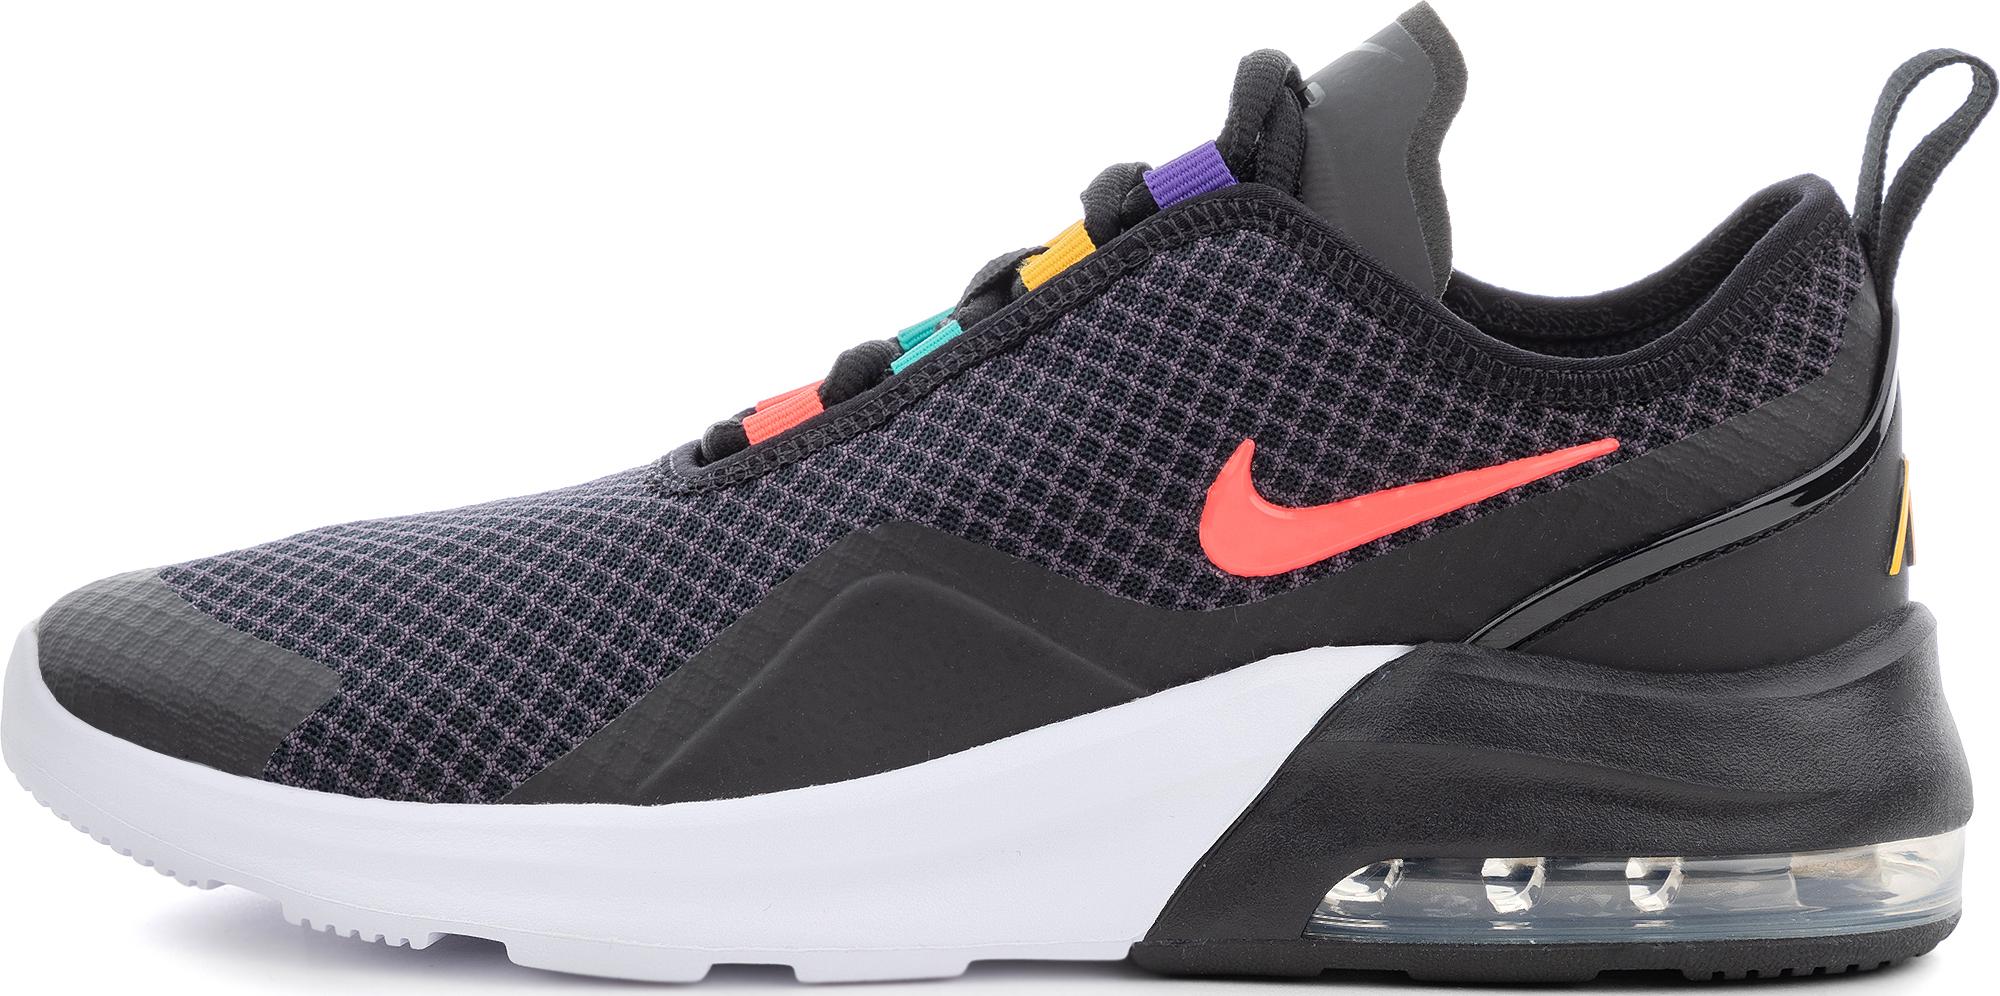 Nike Кроссовки для девочек Nike Air Max Motion 2, размер 39 цена